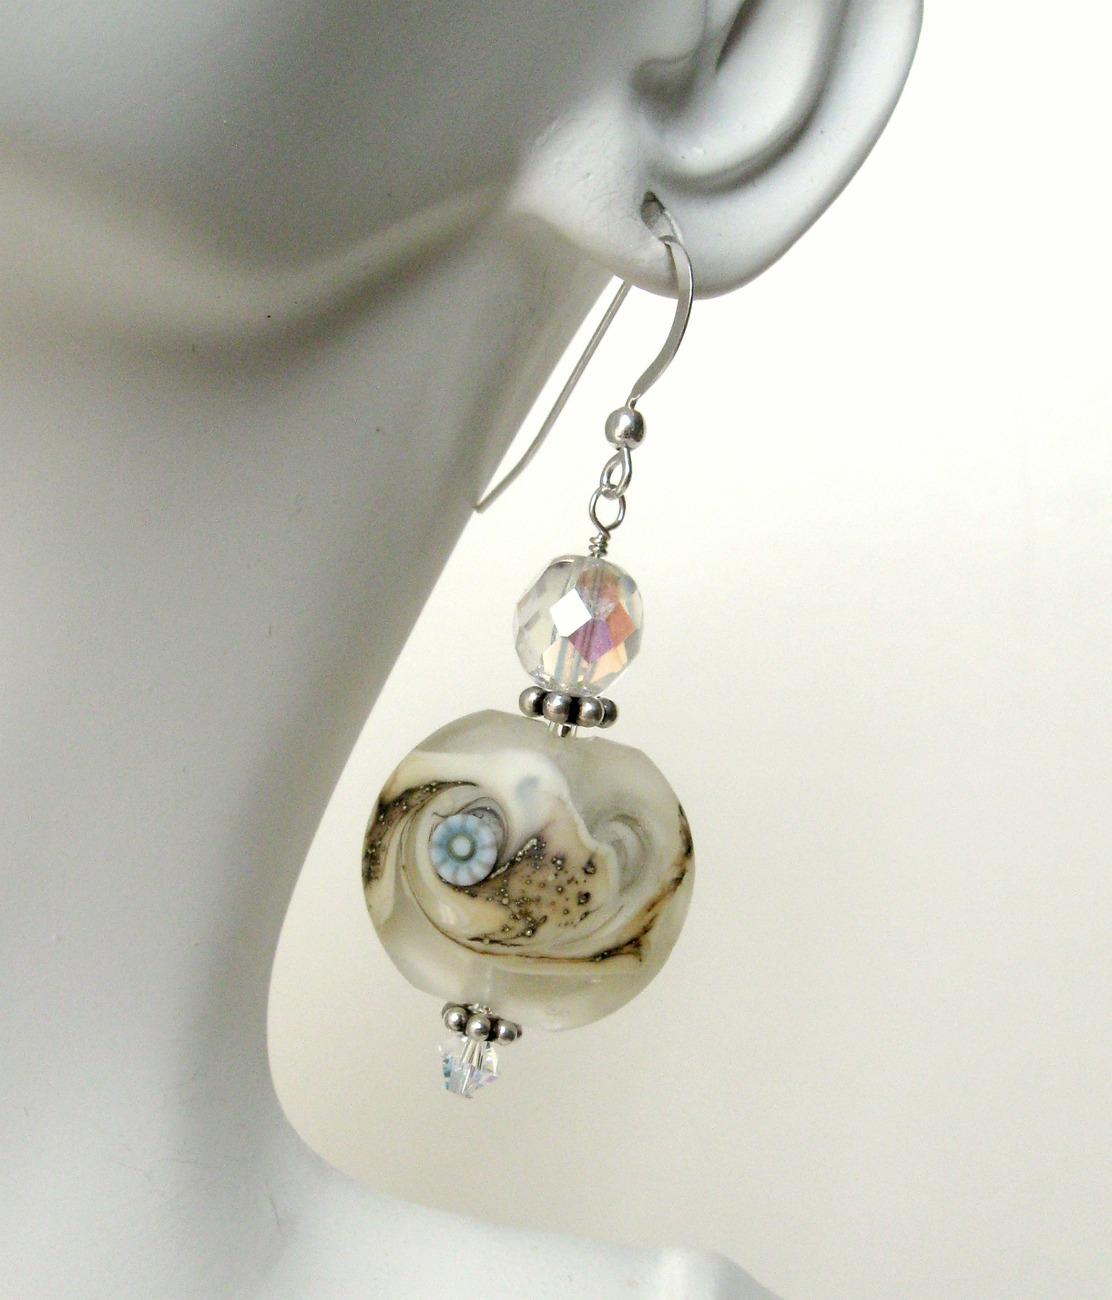 Beach inspired lampwork glass earrings. Hypoallergenic wires